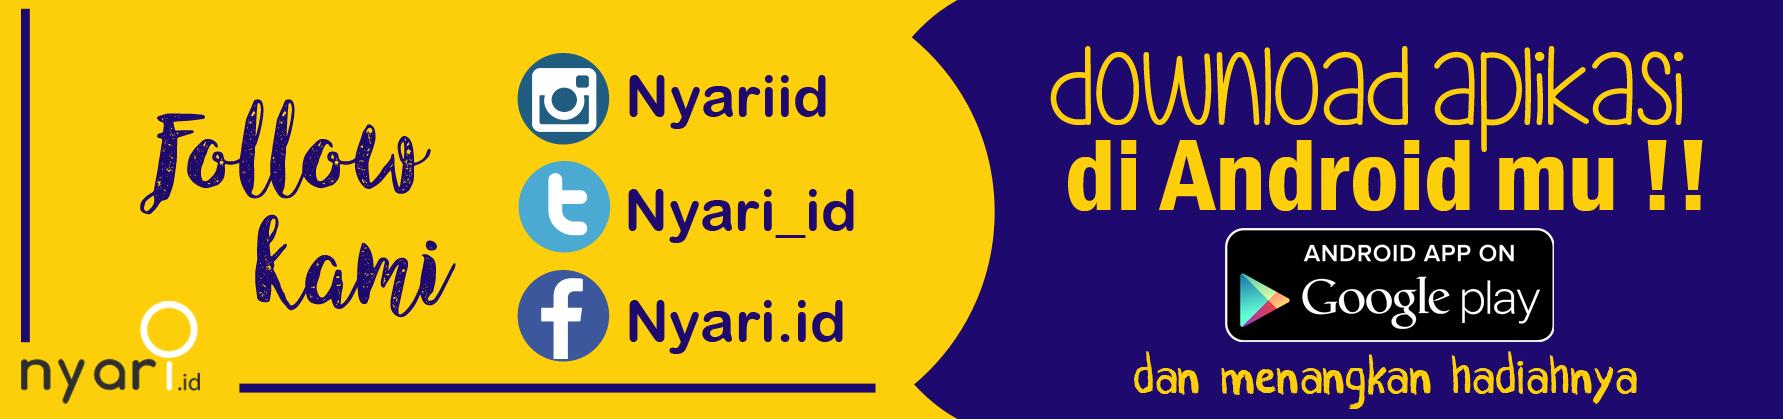 Media Sosial Nyari.id